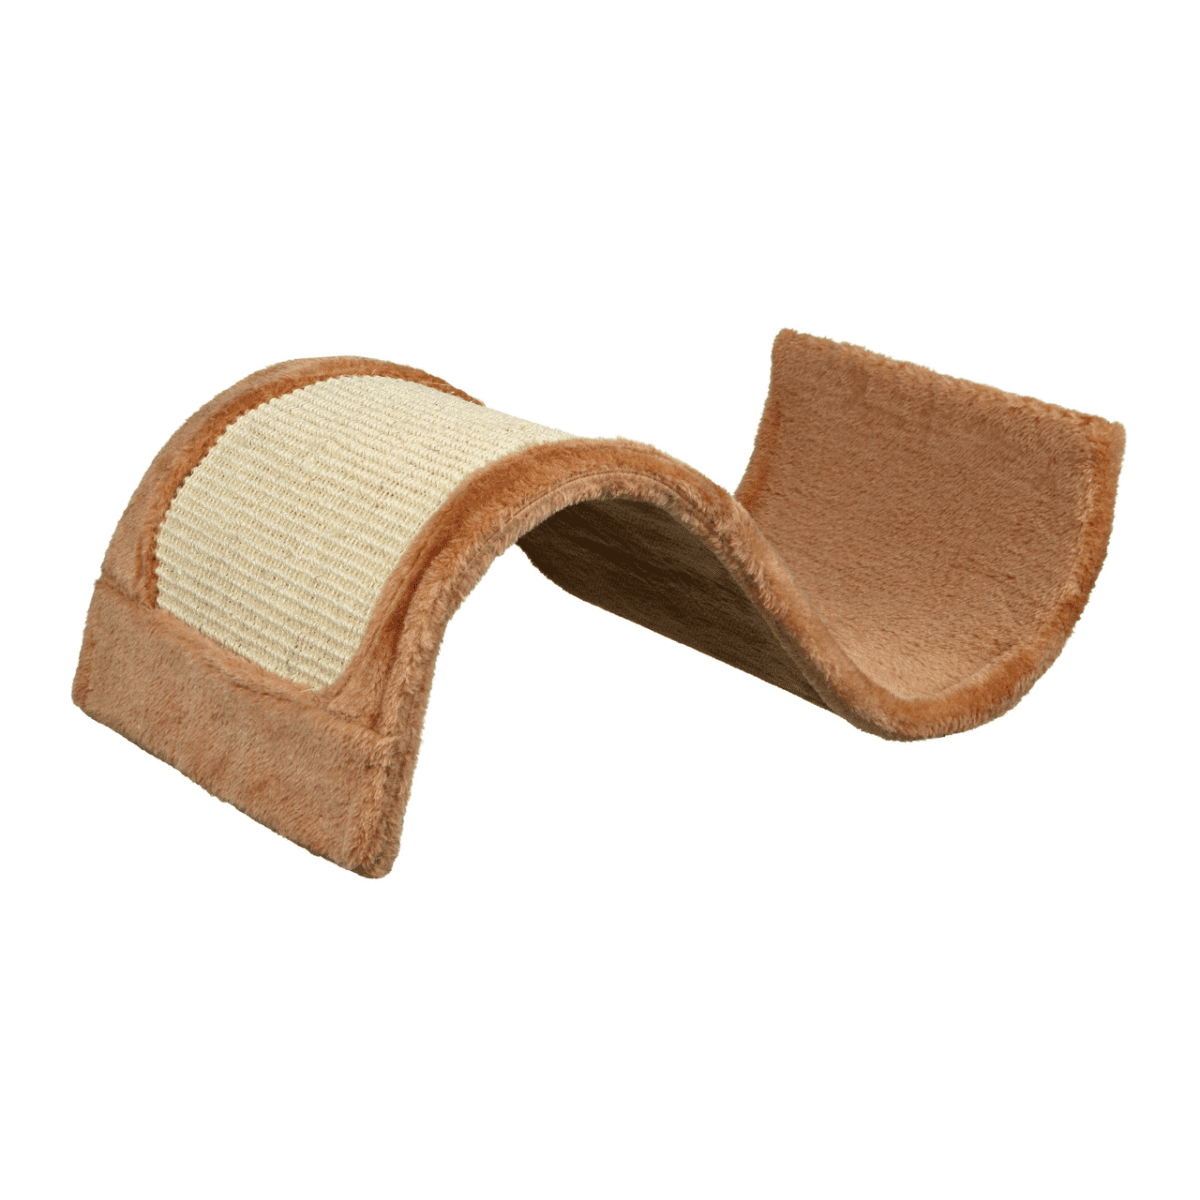 Trixie Wavy когтеточка для котов, 50×29×18 см